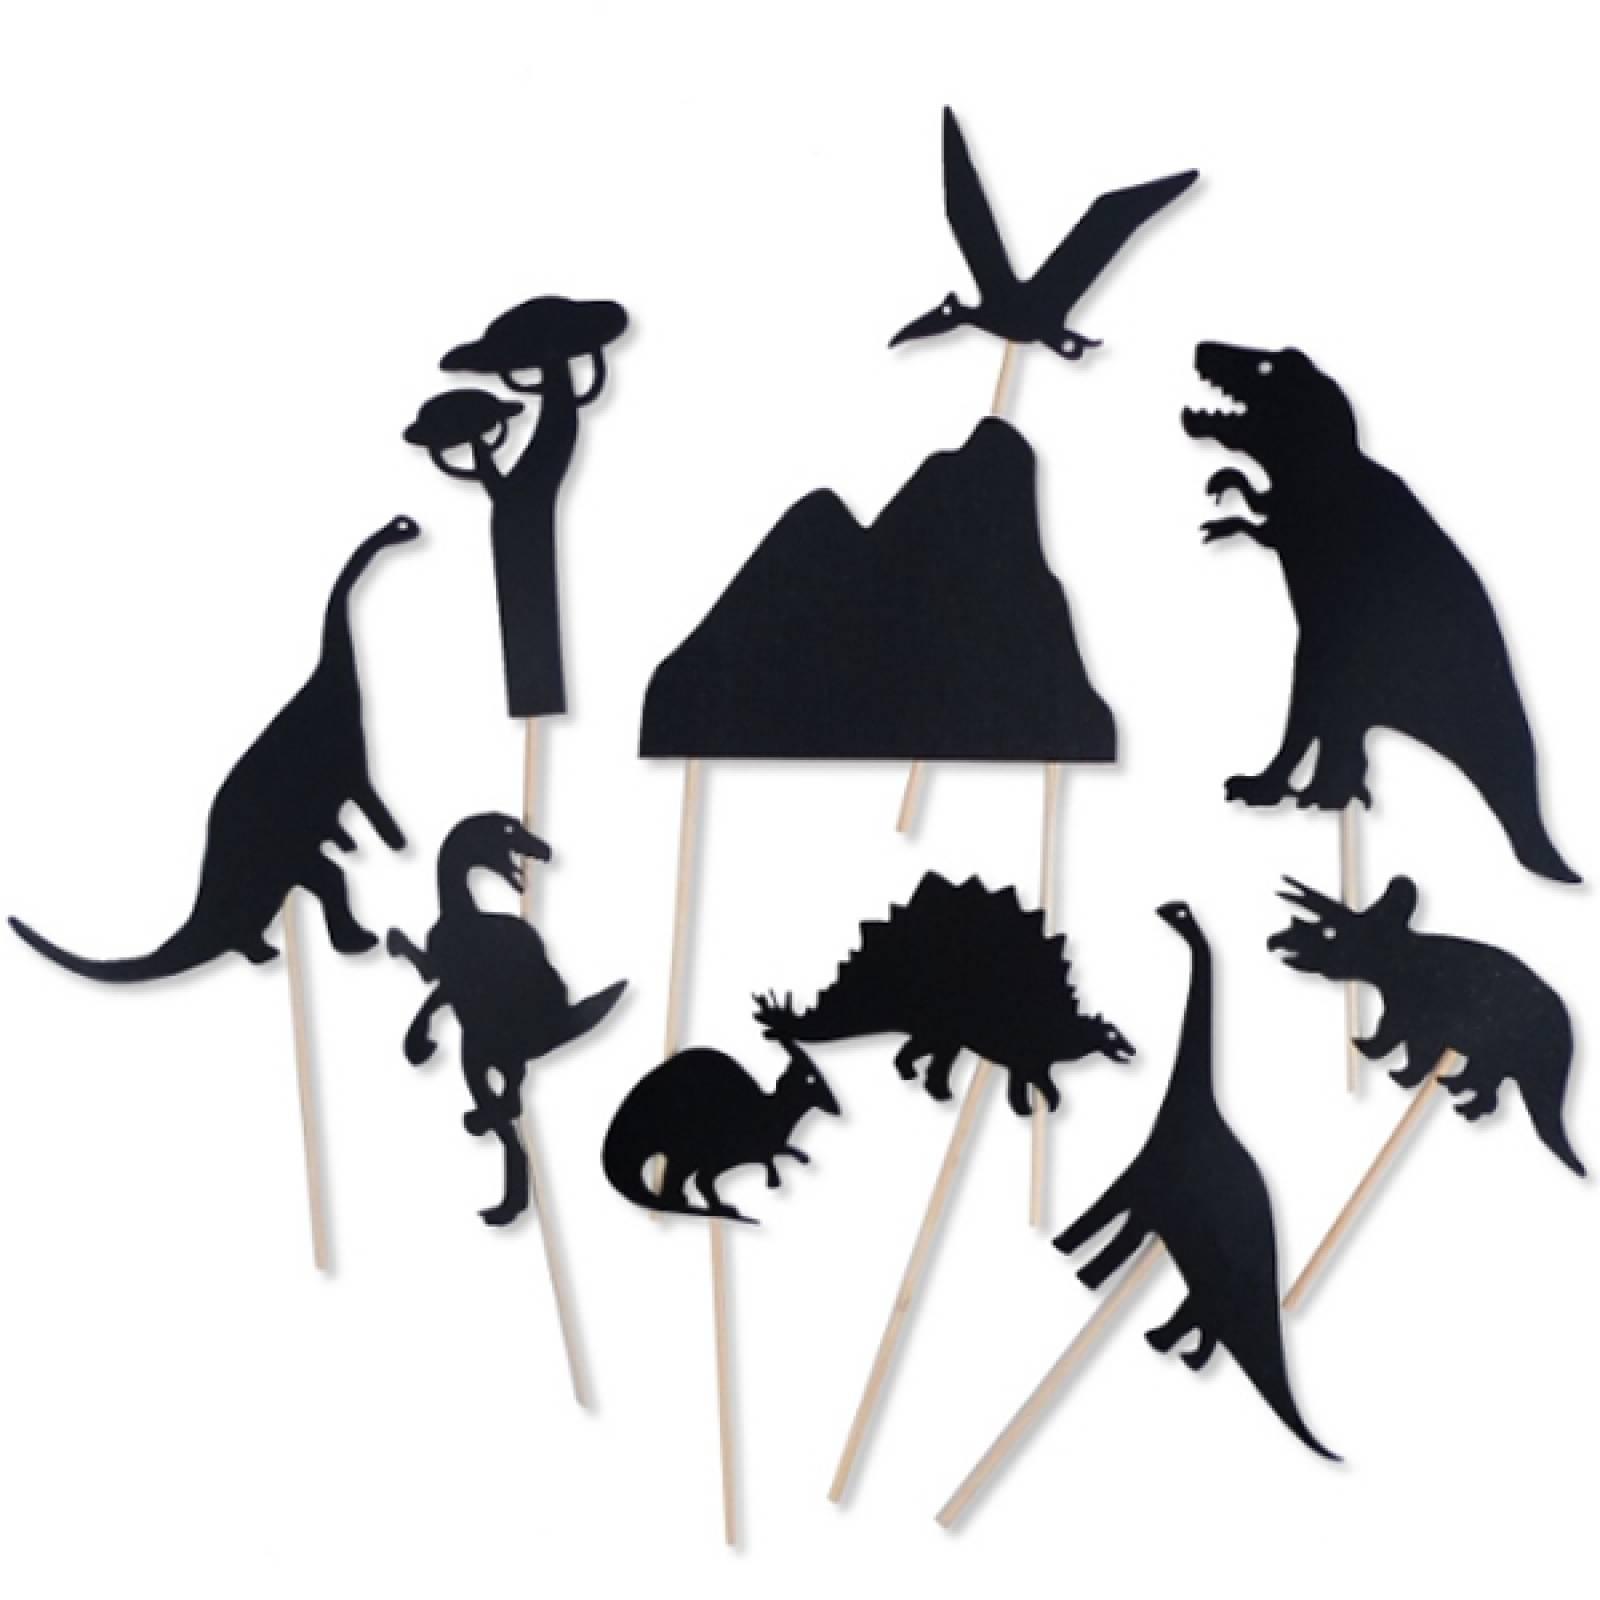 Dinosaur - Shadow Puppets On Sticks 18m+